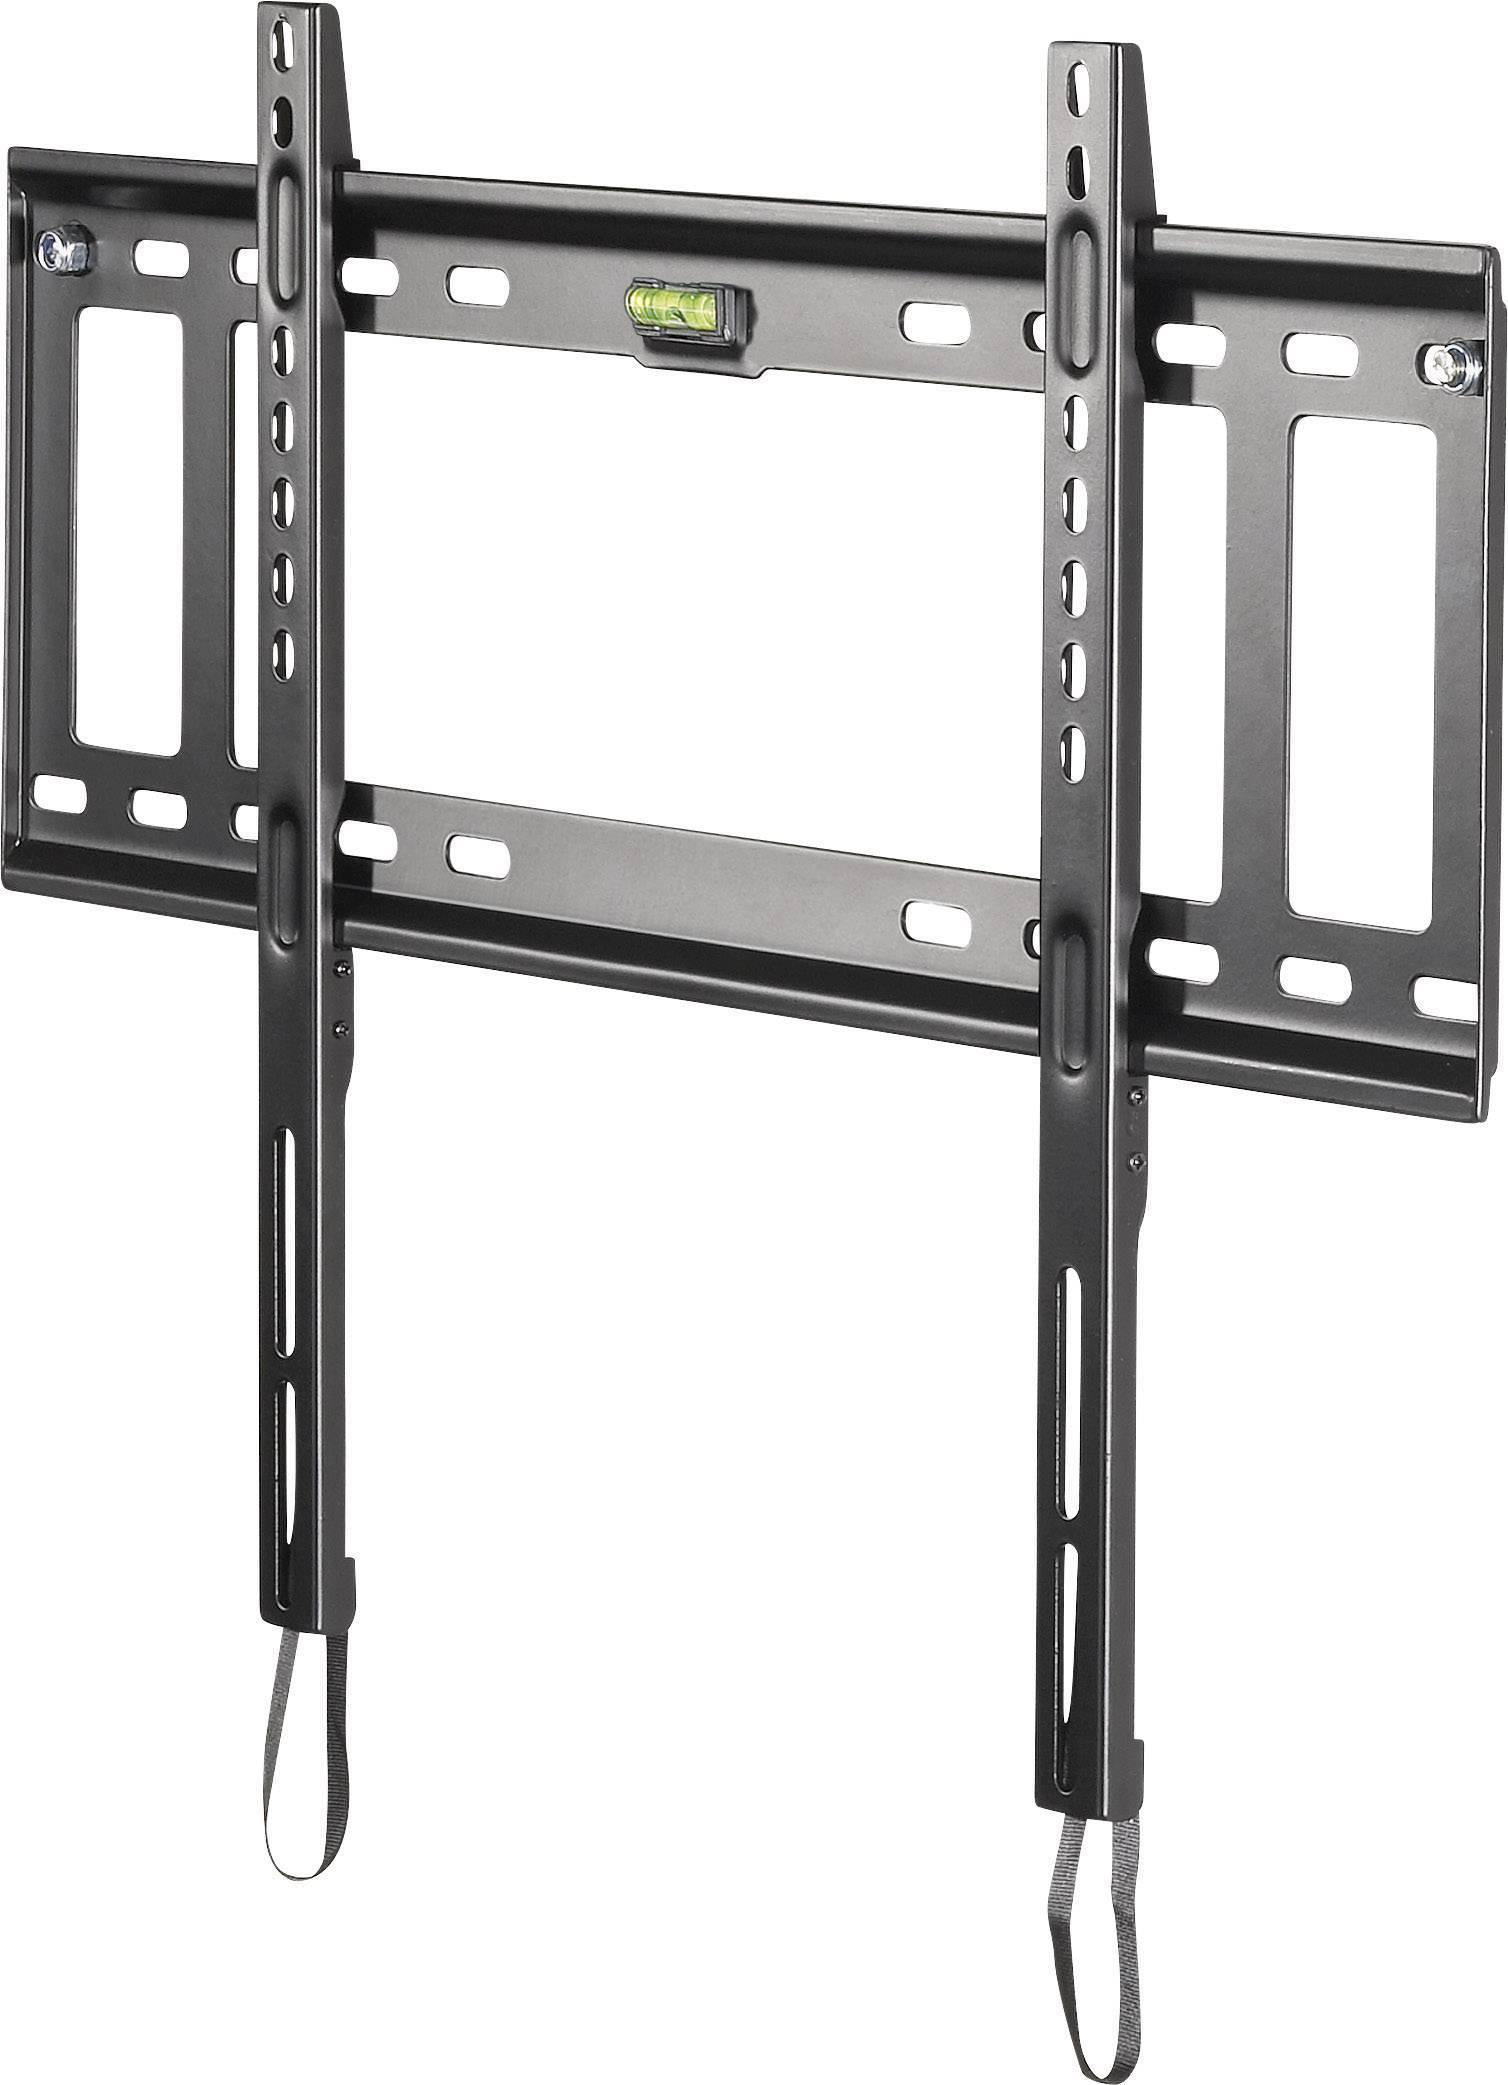 "TV držiak na stenu SpeaKa Professional 989272, neflexibilný, 81,3 cm (32"") - 152,4 cm (60"")"